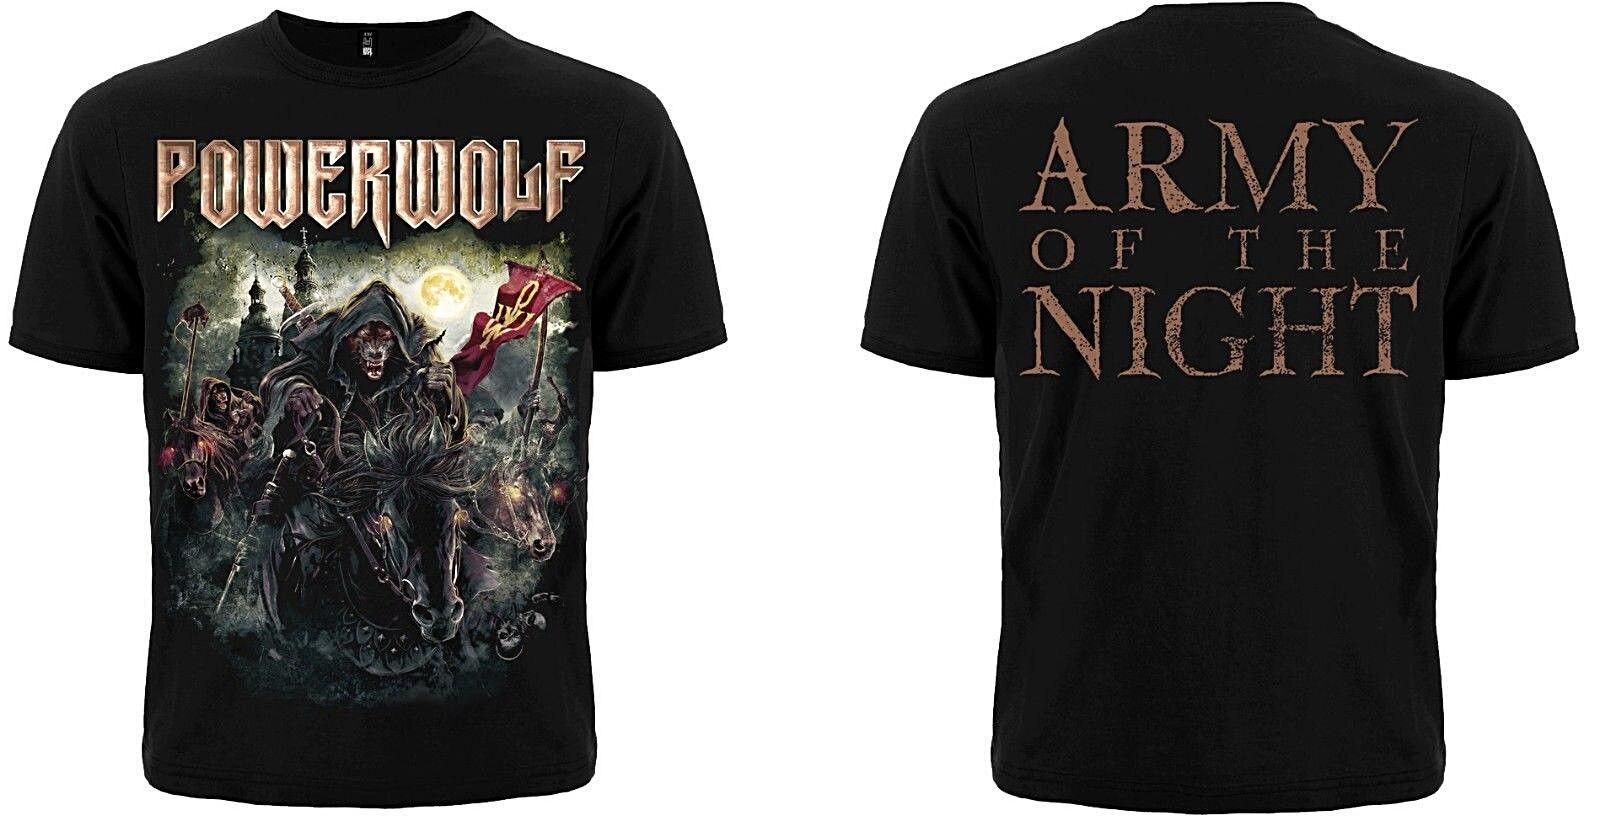 Powerwolf The Metal Mass T Shirt Printed T Shirt Men'S Short Sleeve O Neck T Shirts Summer Stree Twear Top Tee Plus Size